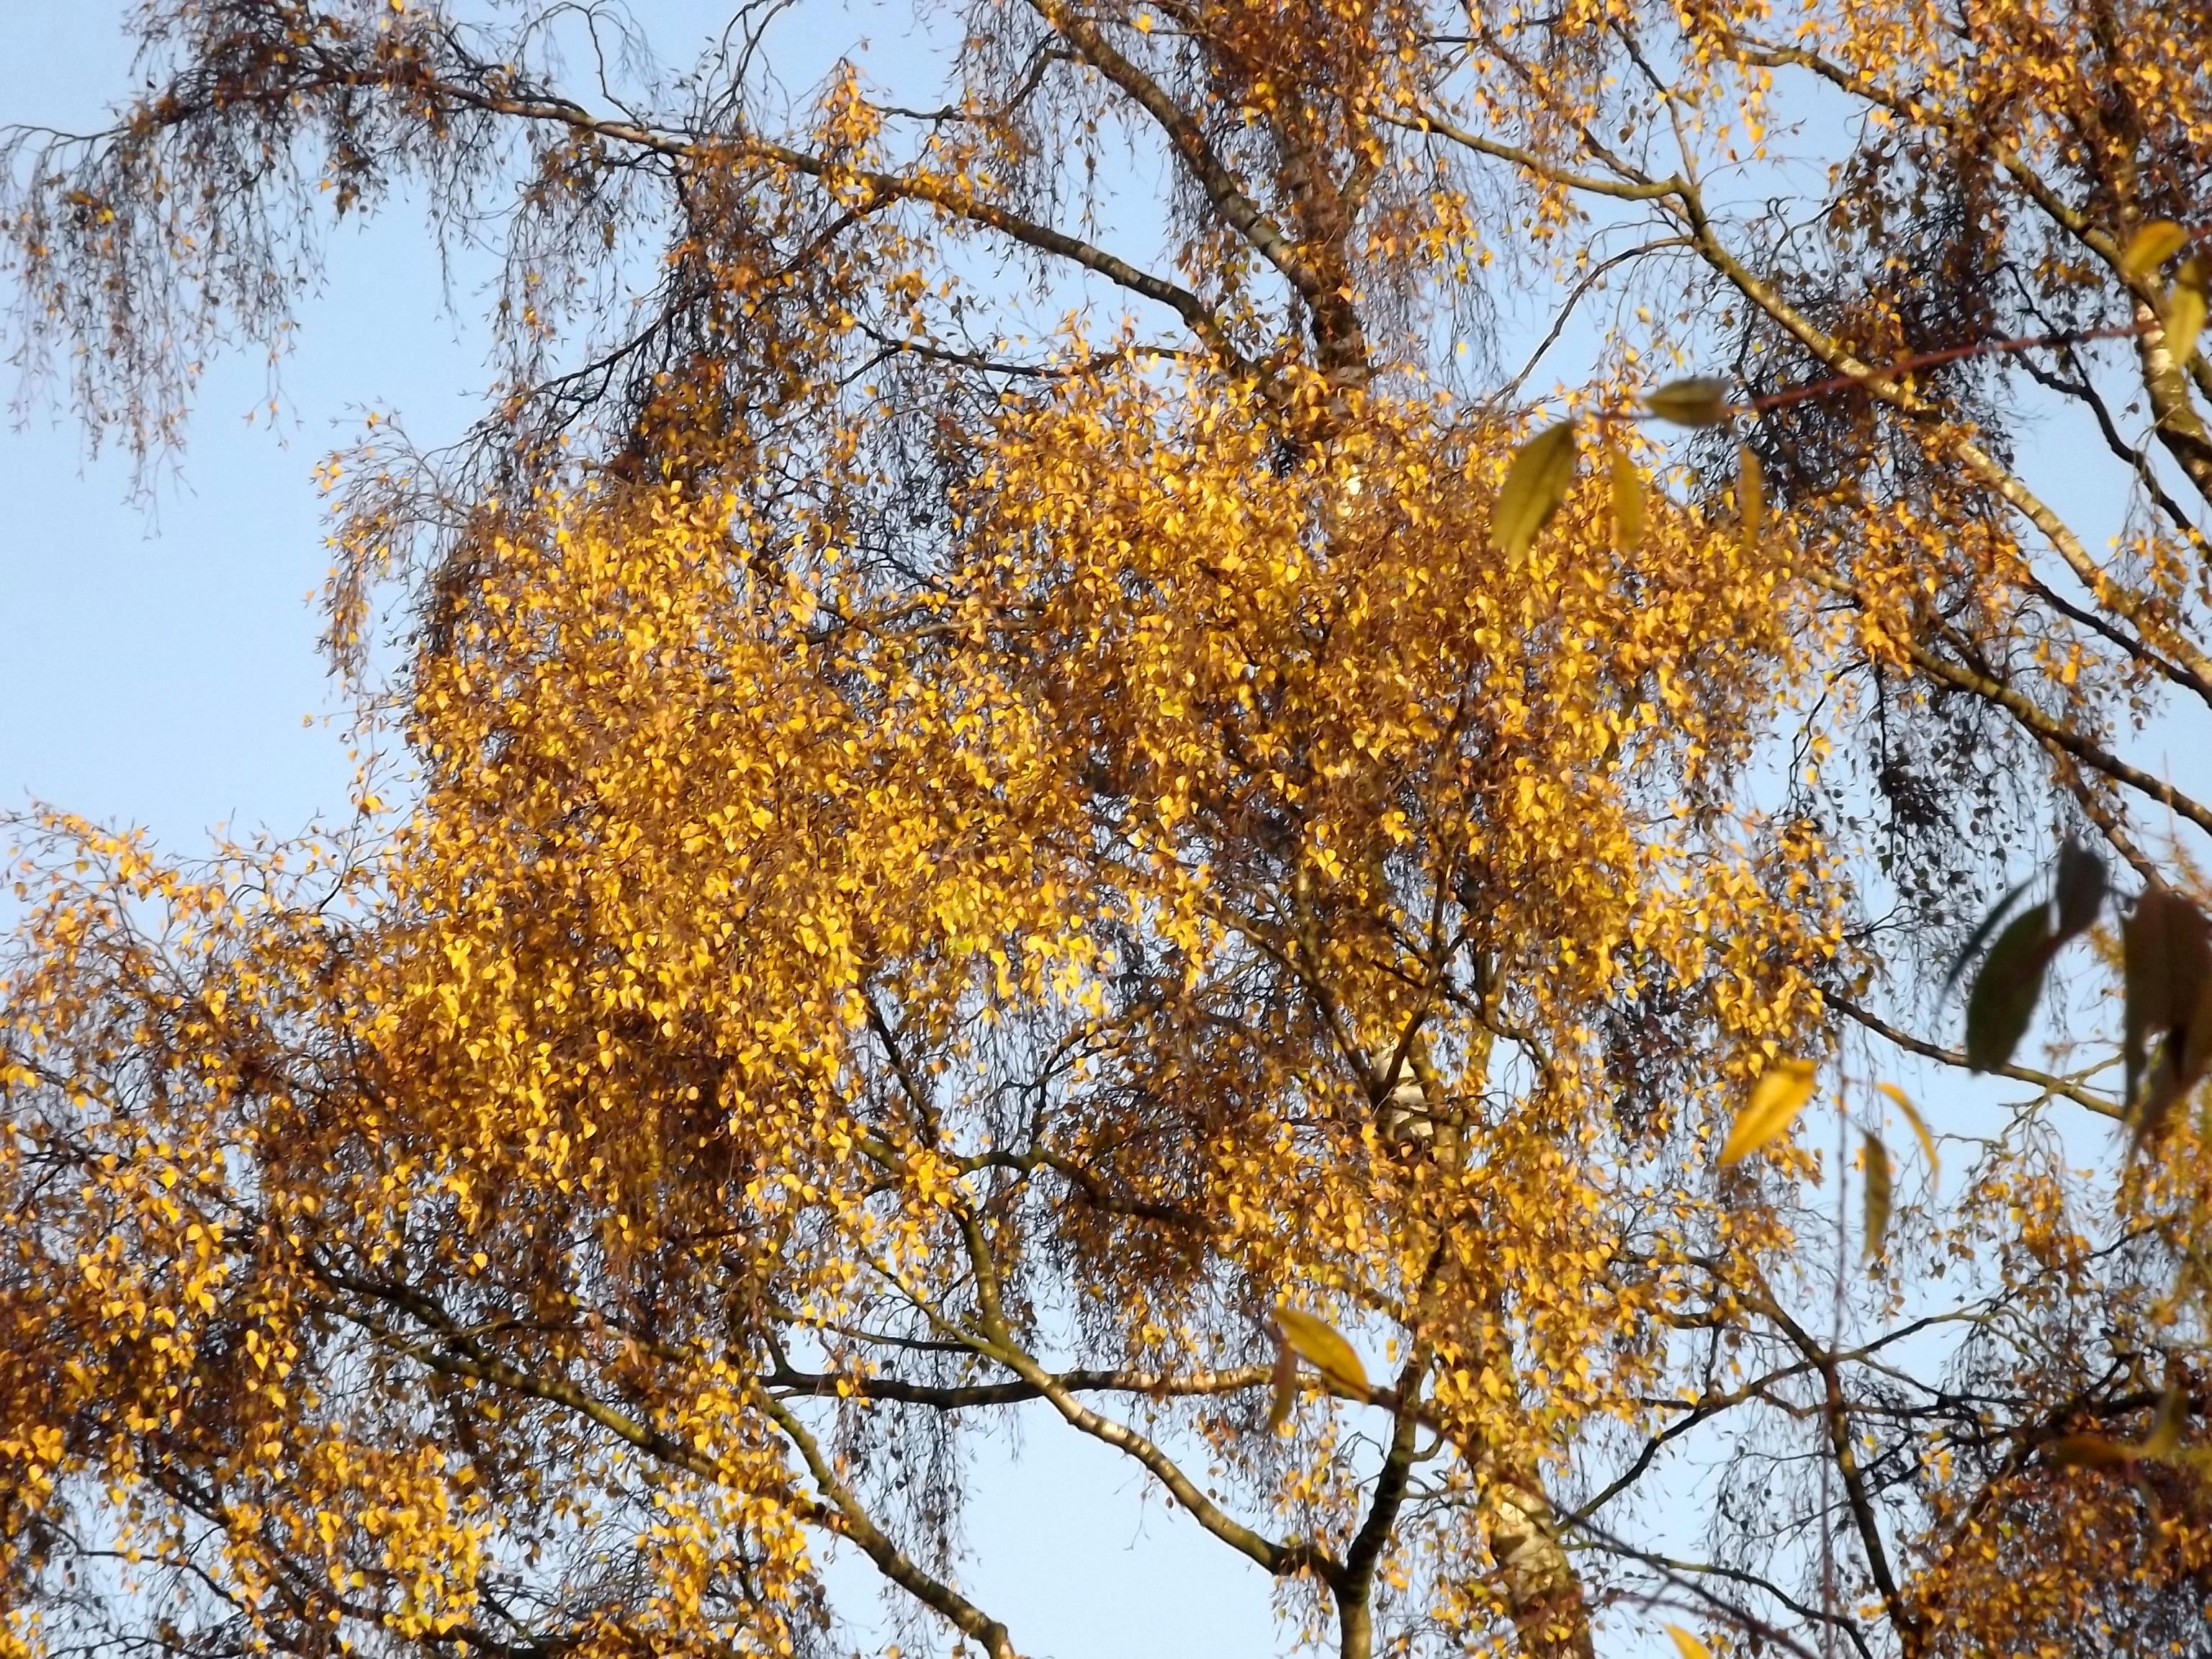 6598-birke-gold-gelb